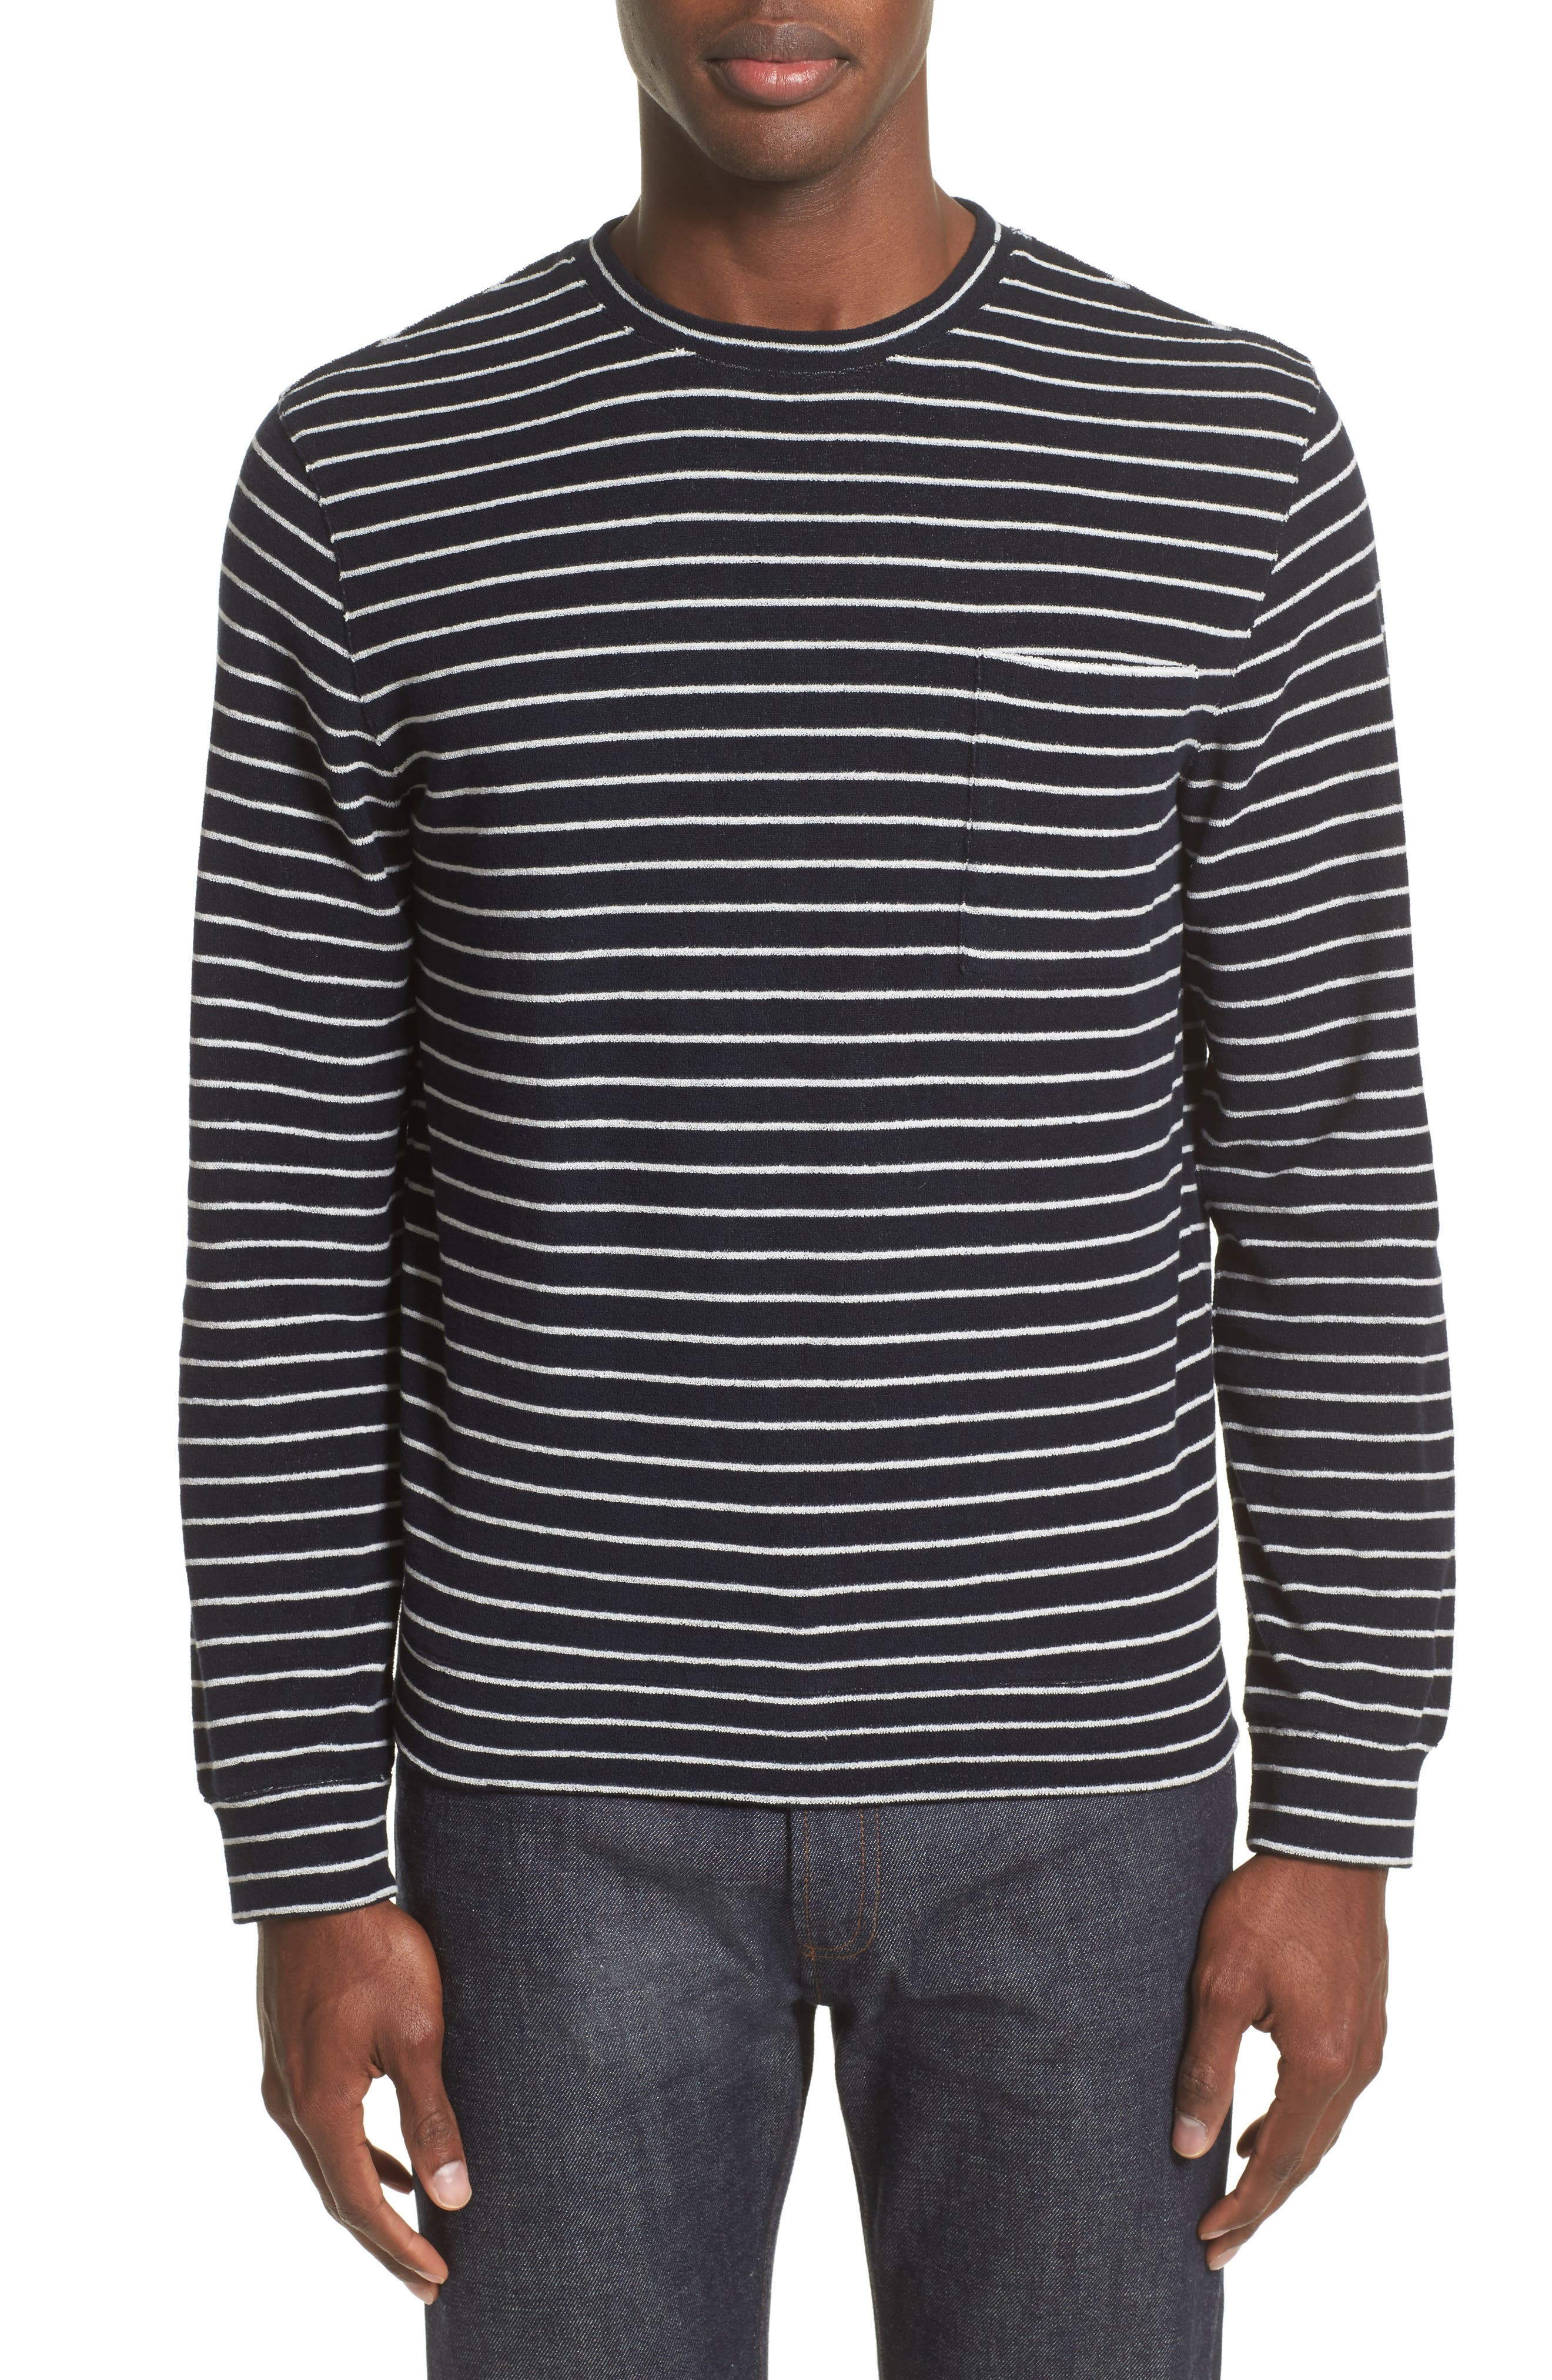 Main Image - A.P.C. Yogi Striped Terry Sweatshirt